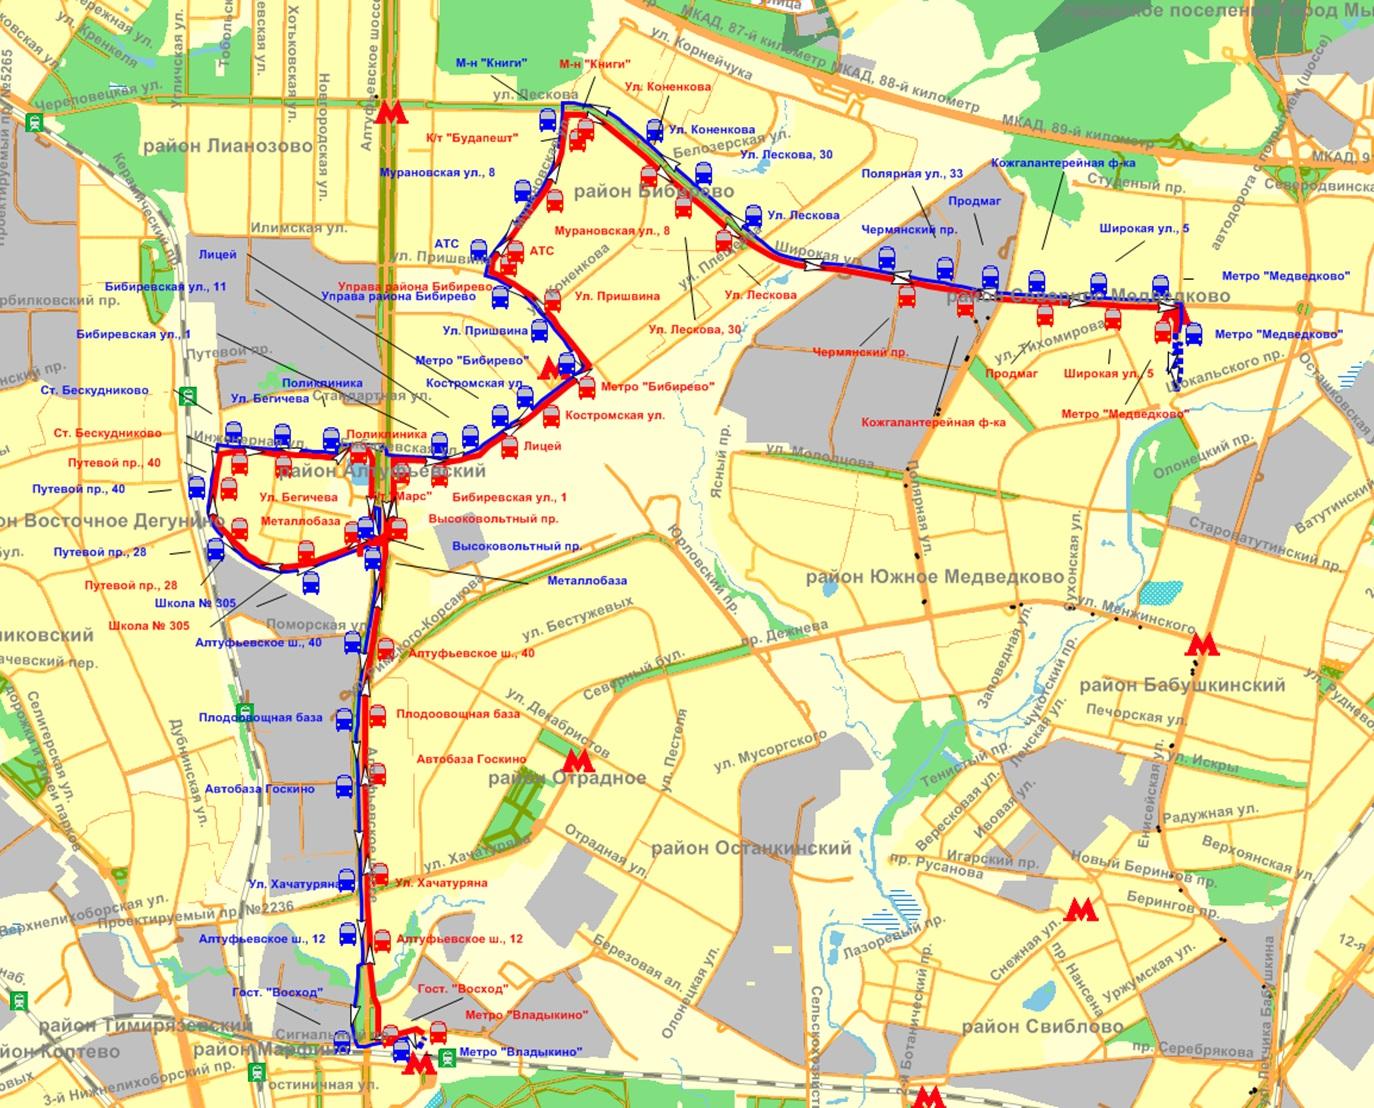 гуп мосгортранс схема маршрутов